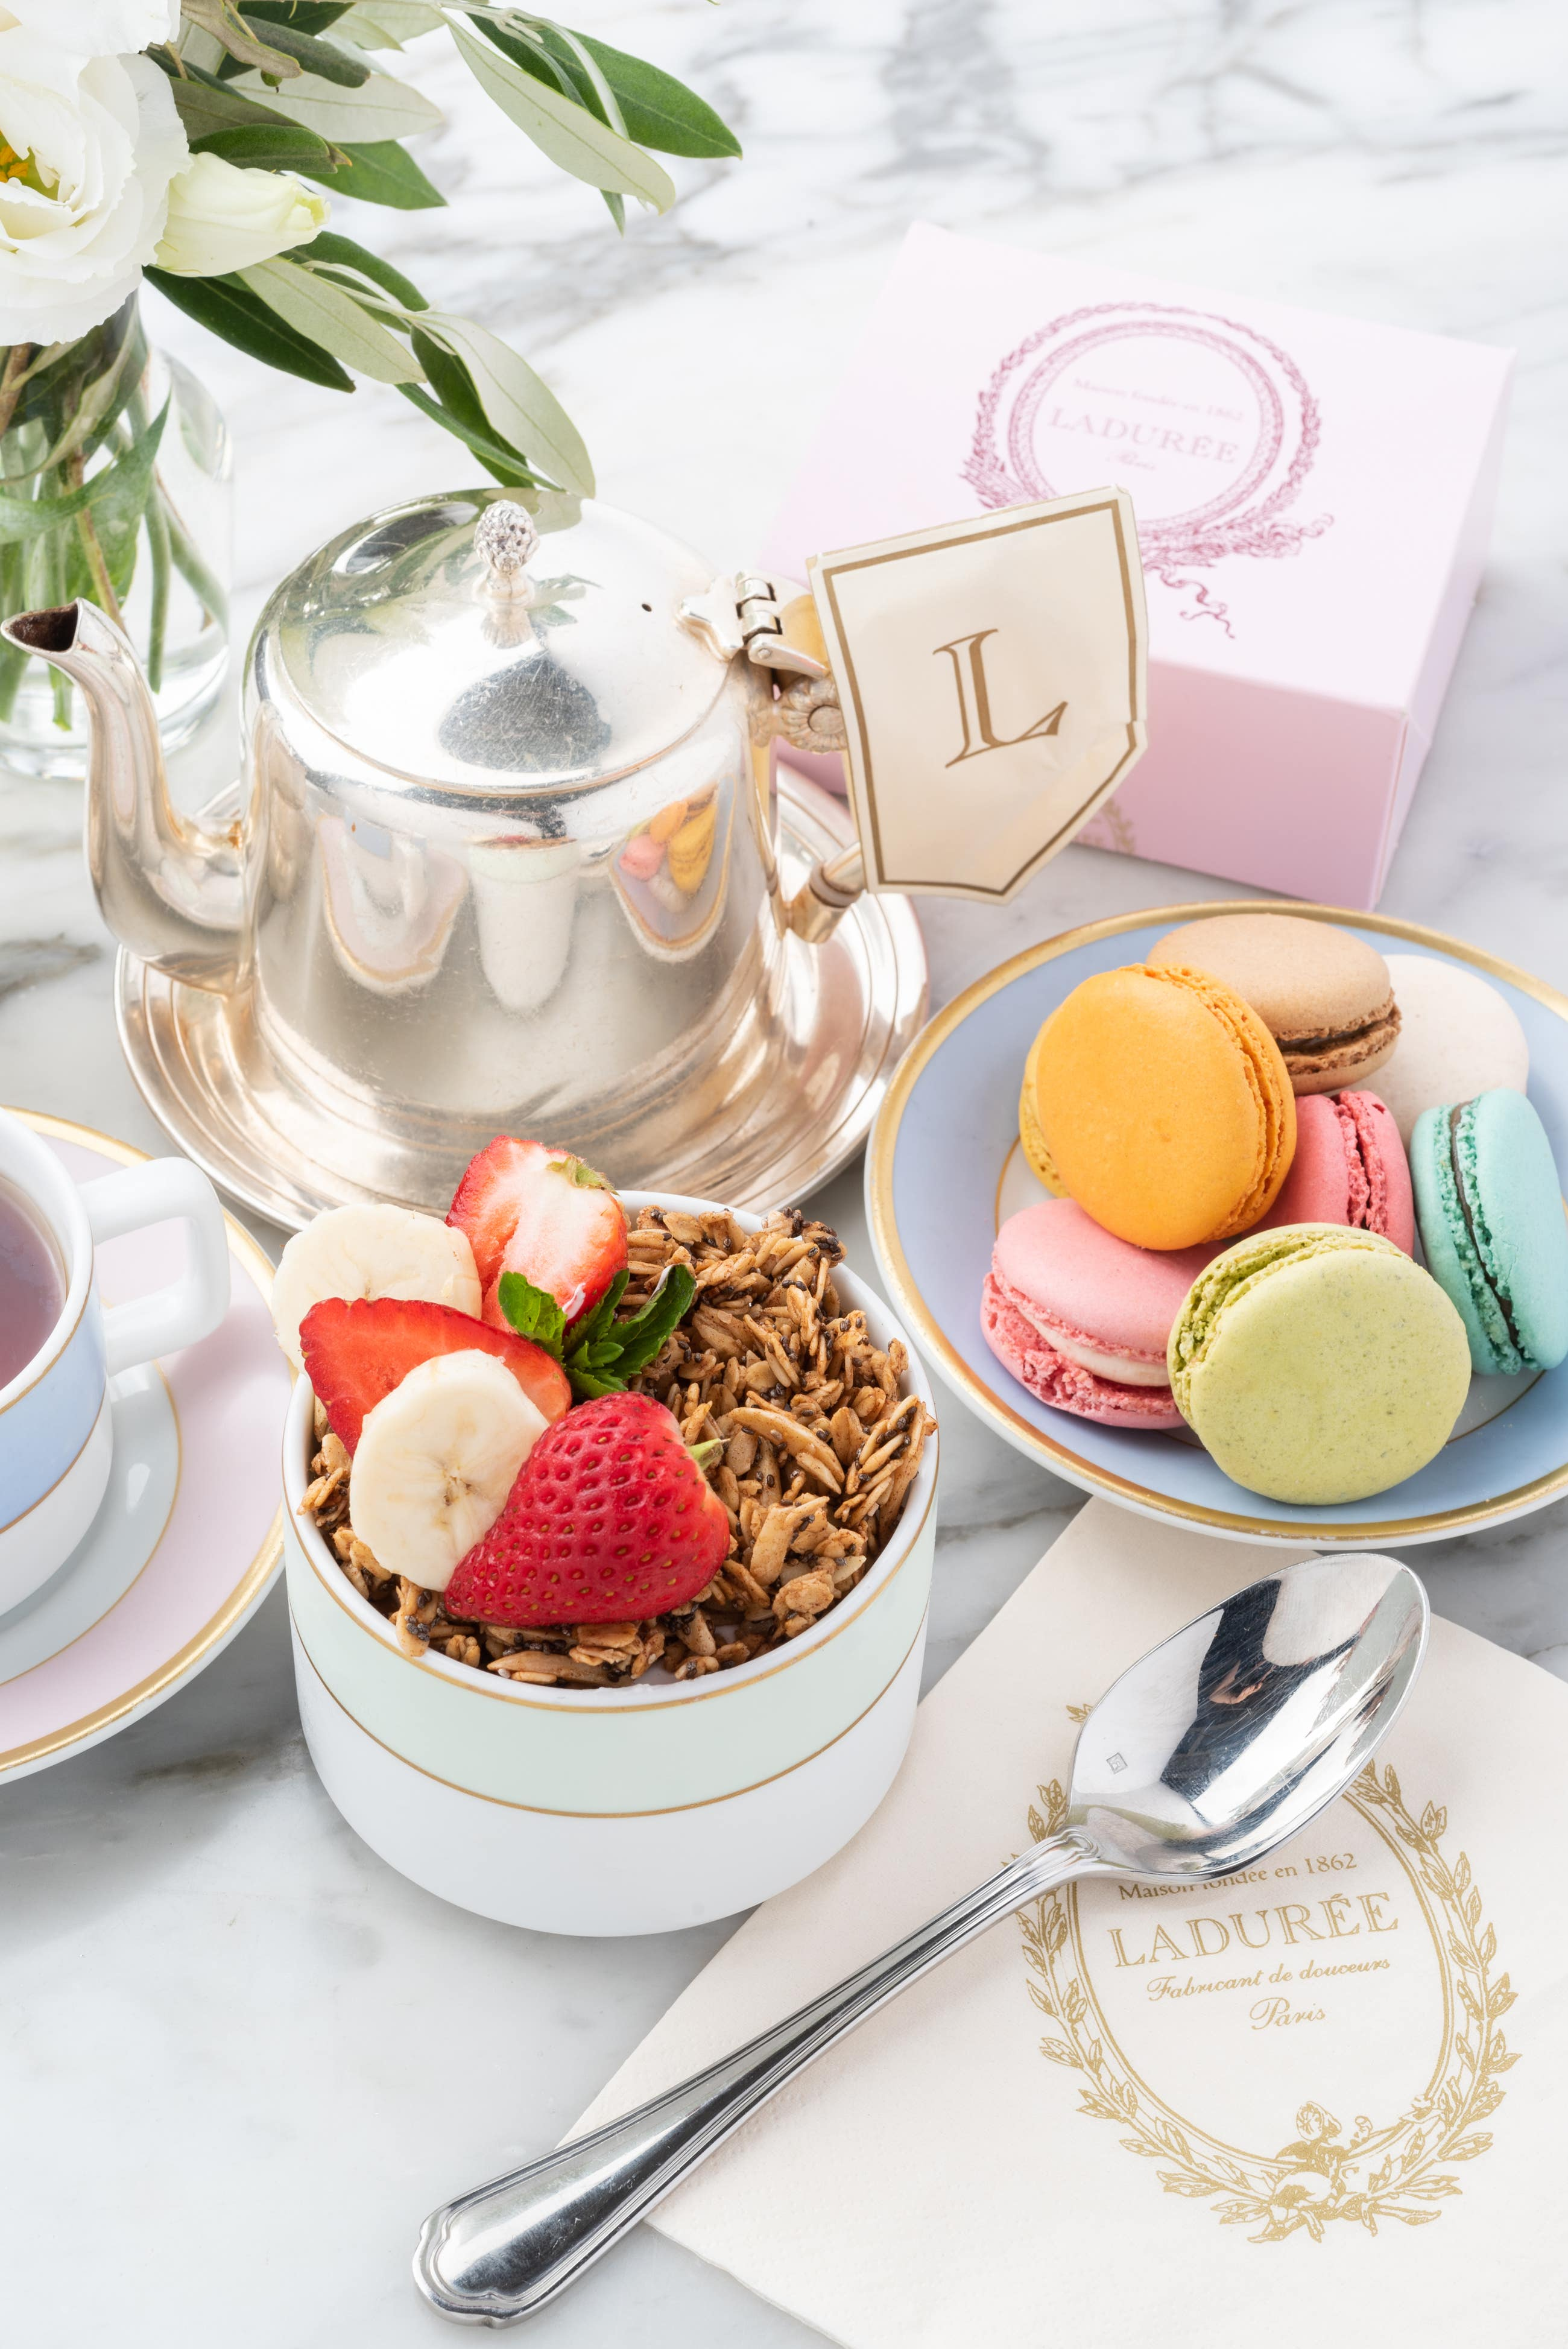 Tea and macarons at Ladurée Beverly Hills